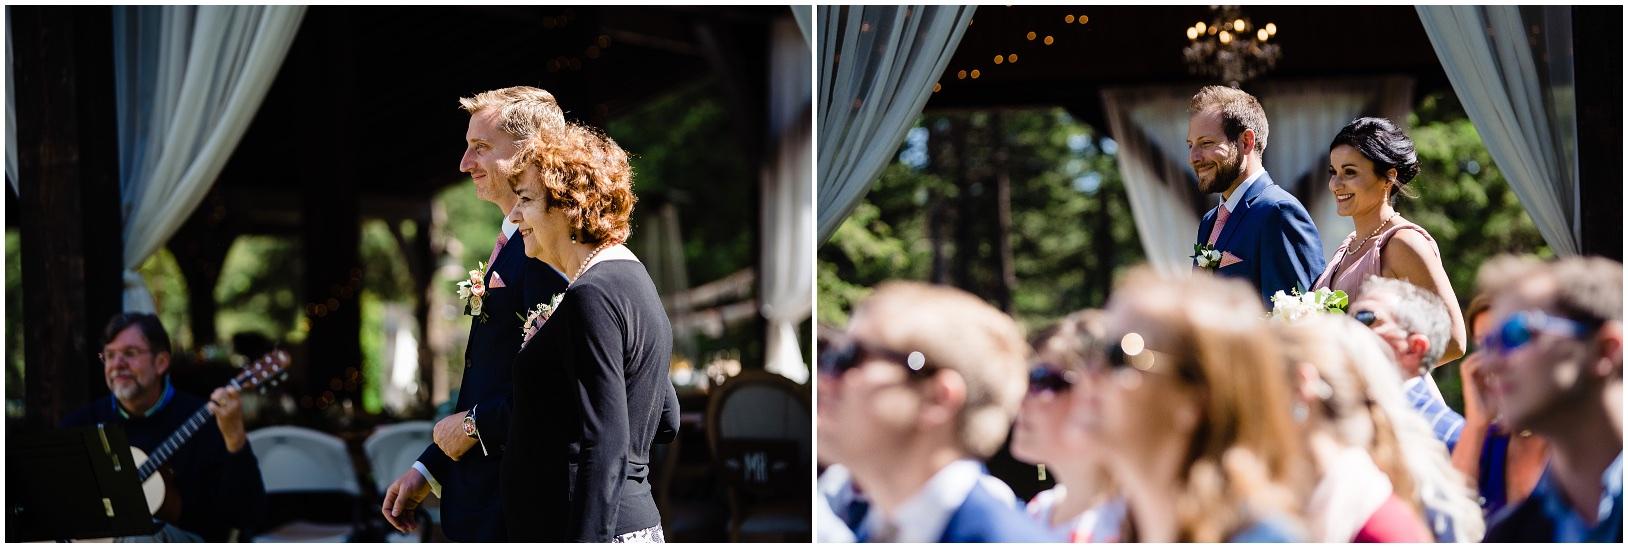 lindseyjanephoto_wedding0050.jpg